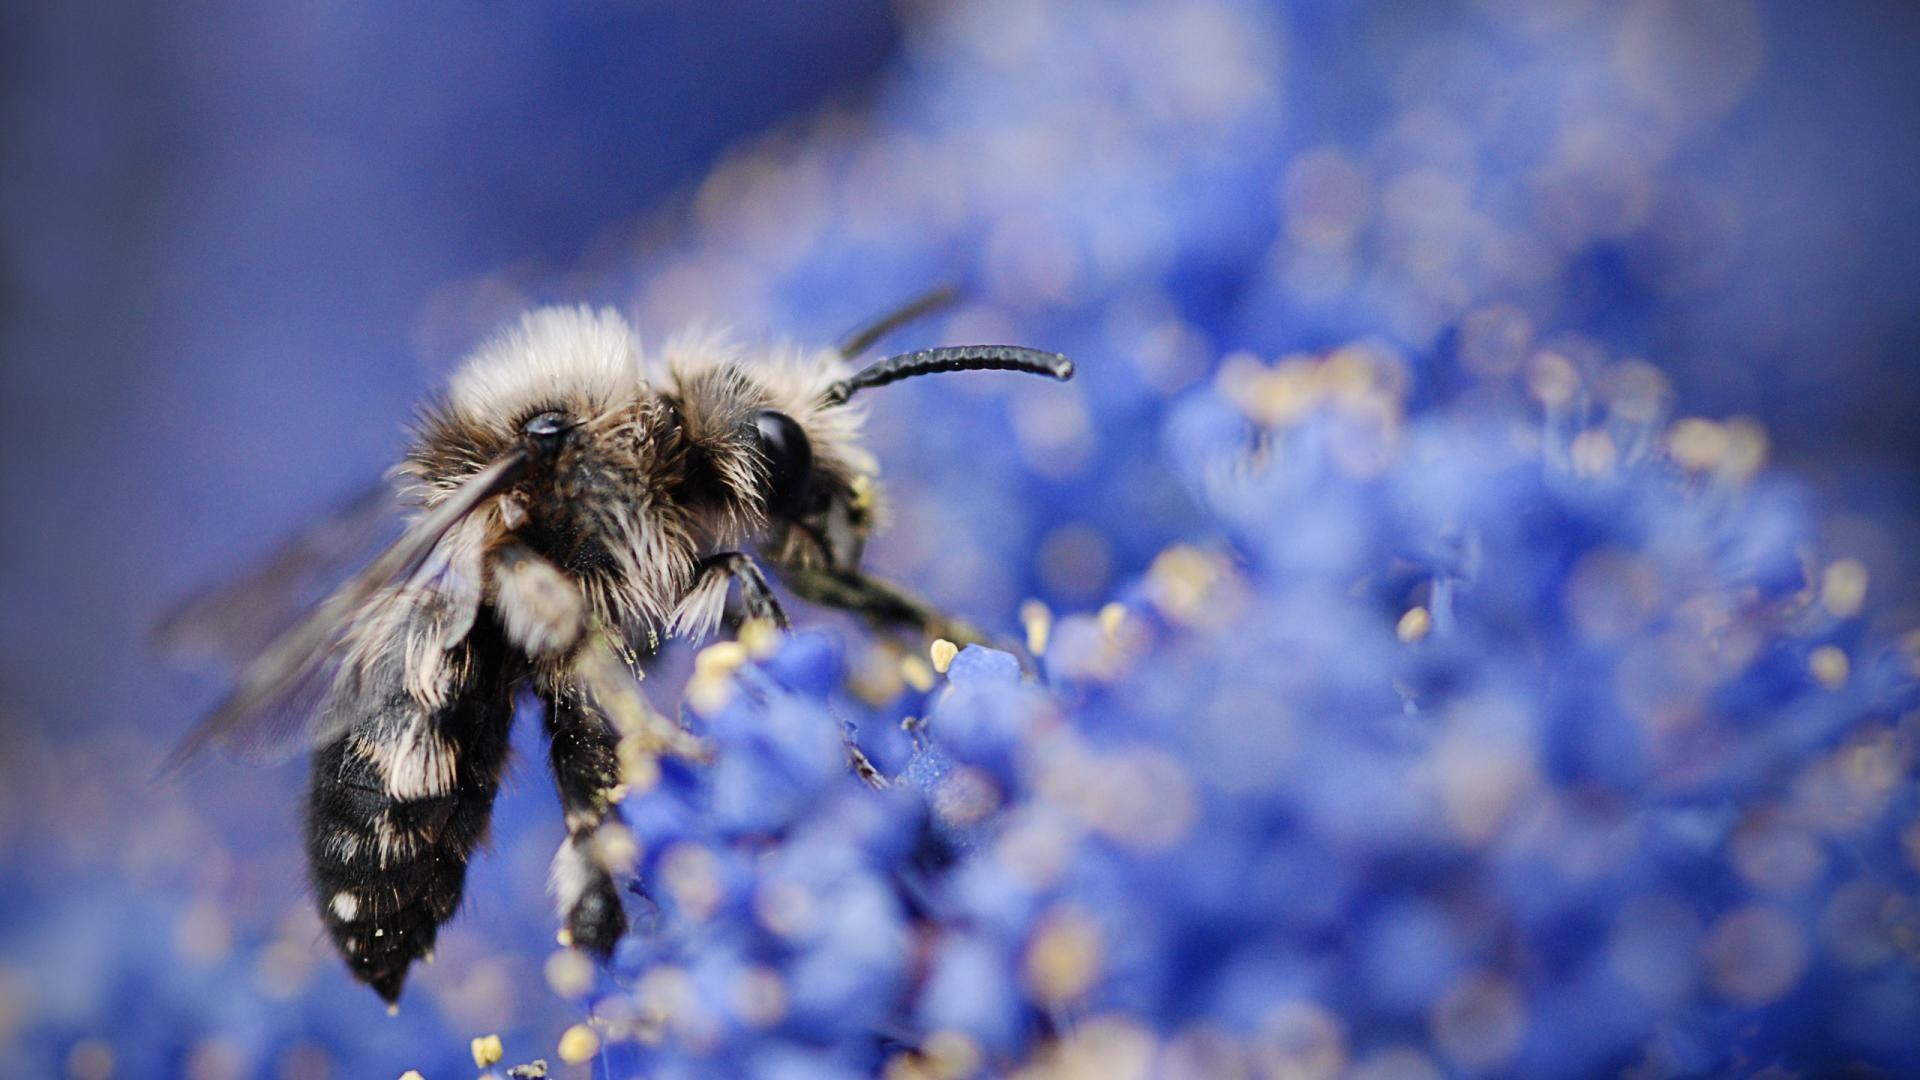 Galaxy S8 Wallpaper Hd Bee Wallpaper 64 Images